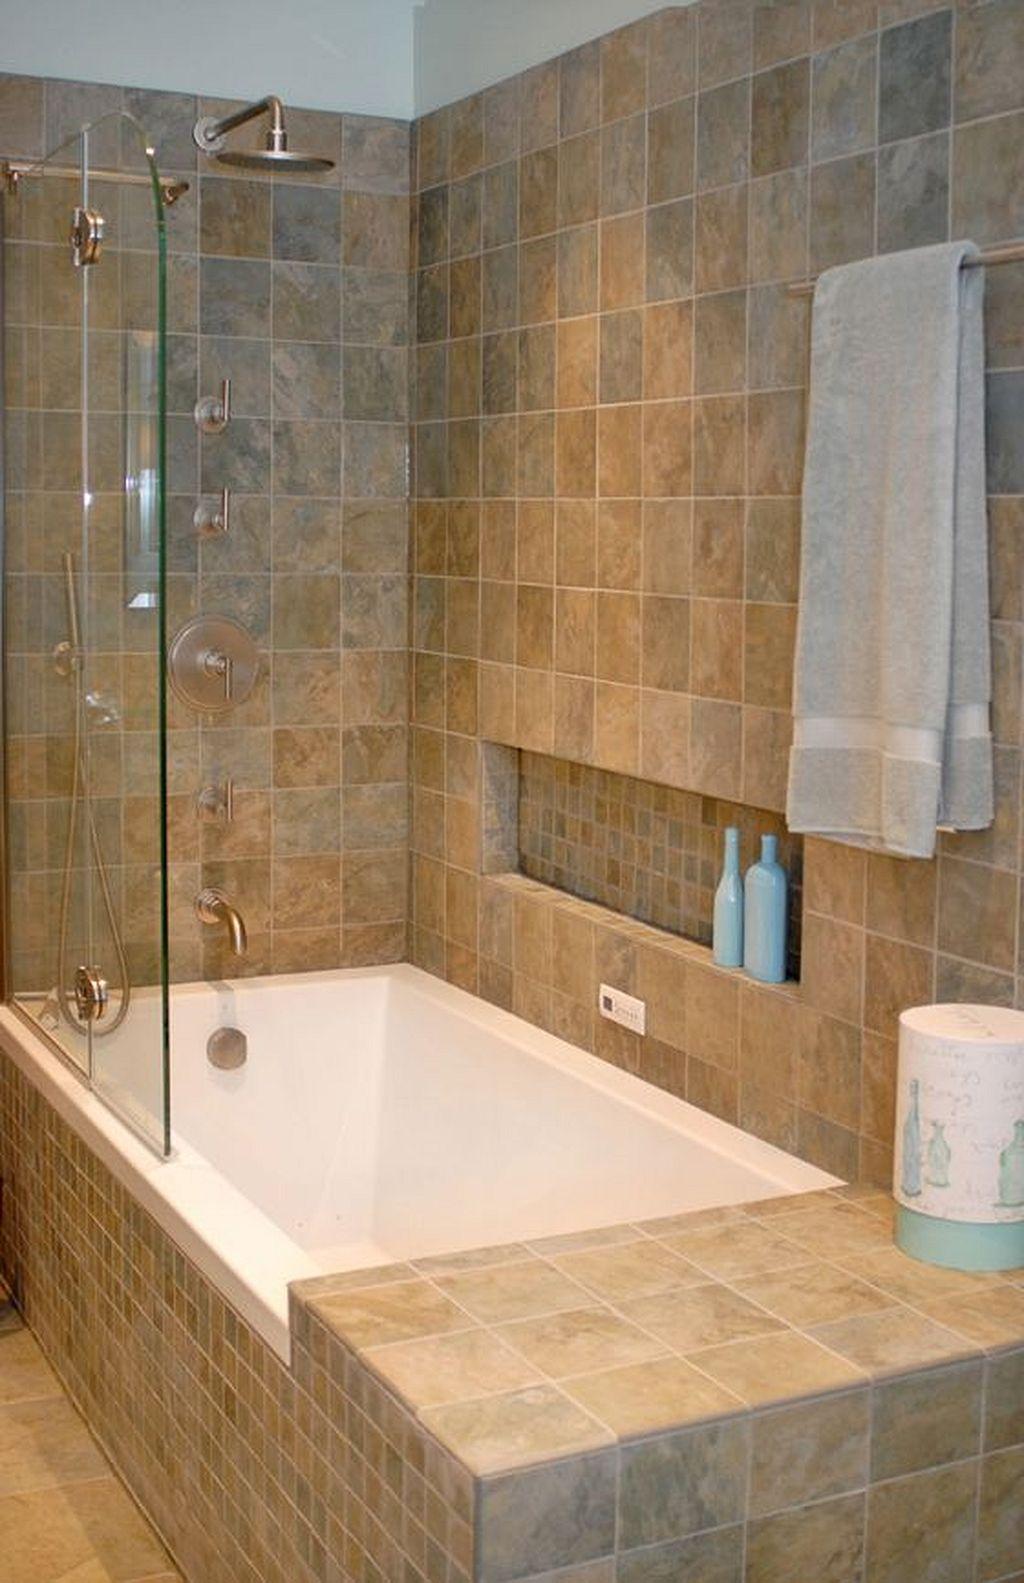 Tiny Bathroom Tub Shower Combo Remodeling Ideas | Bathroom tub ...